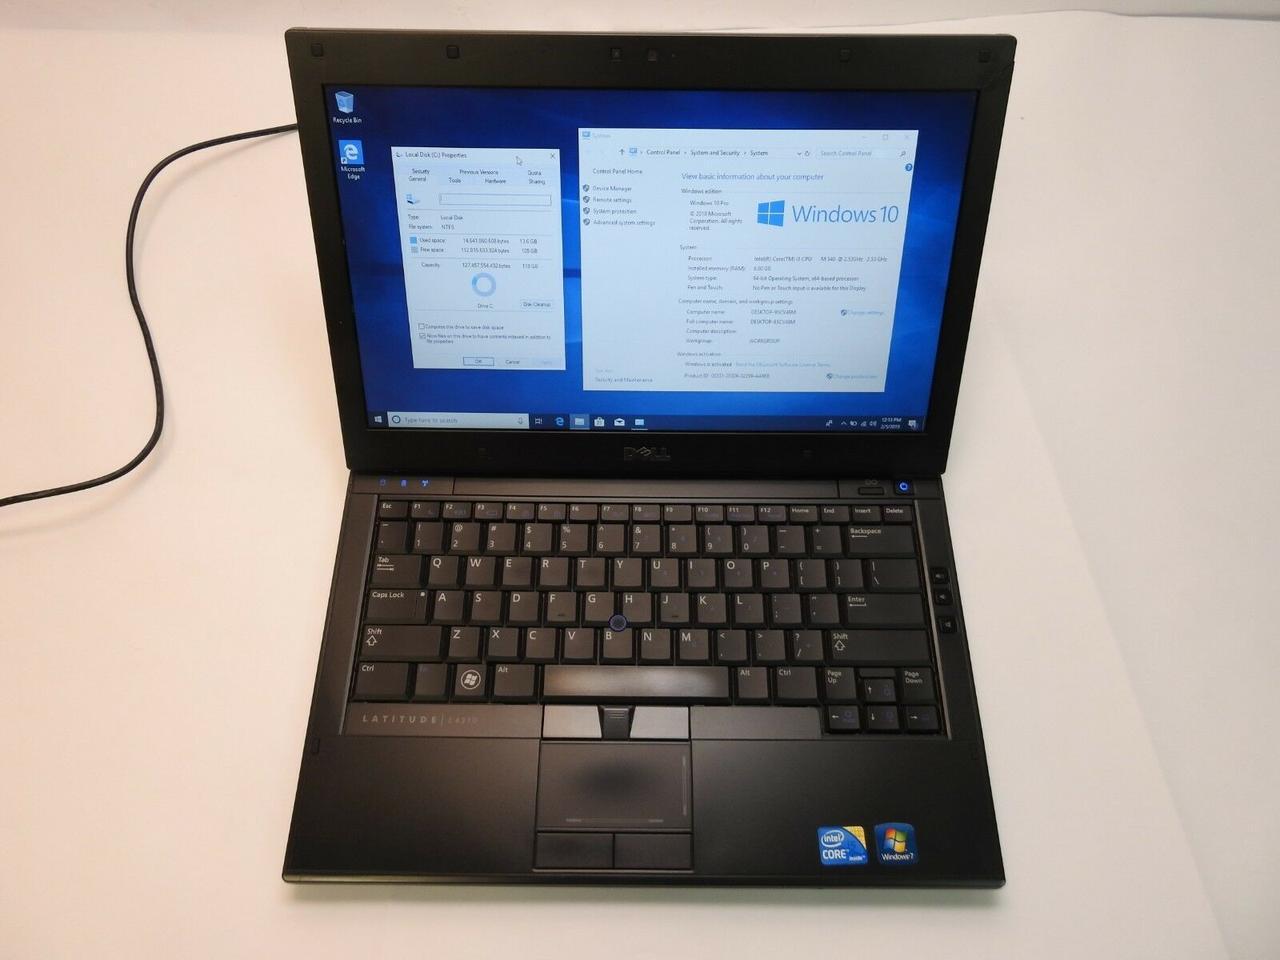 Ноутбук, notebook, Toshiba Tecra a8, 2 ядра по 2,4 ГГц, 2 Гб ОЗУ, HDD 320 Гб